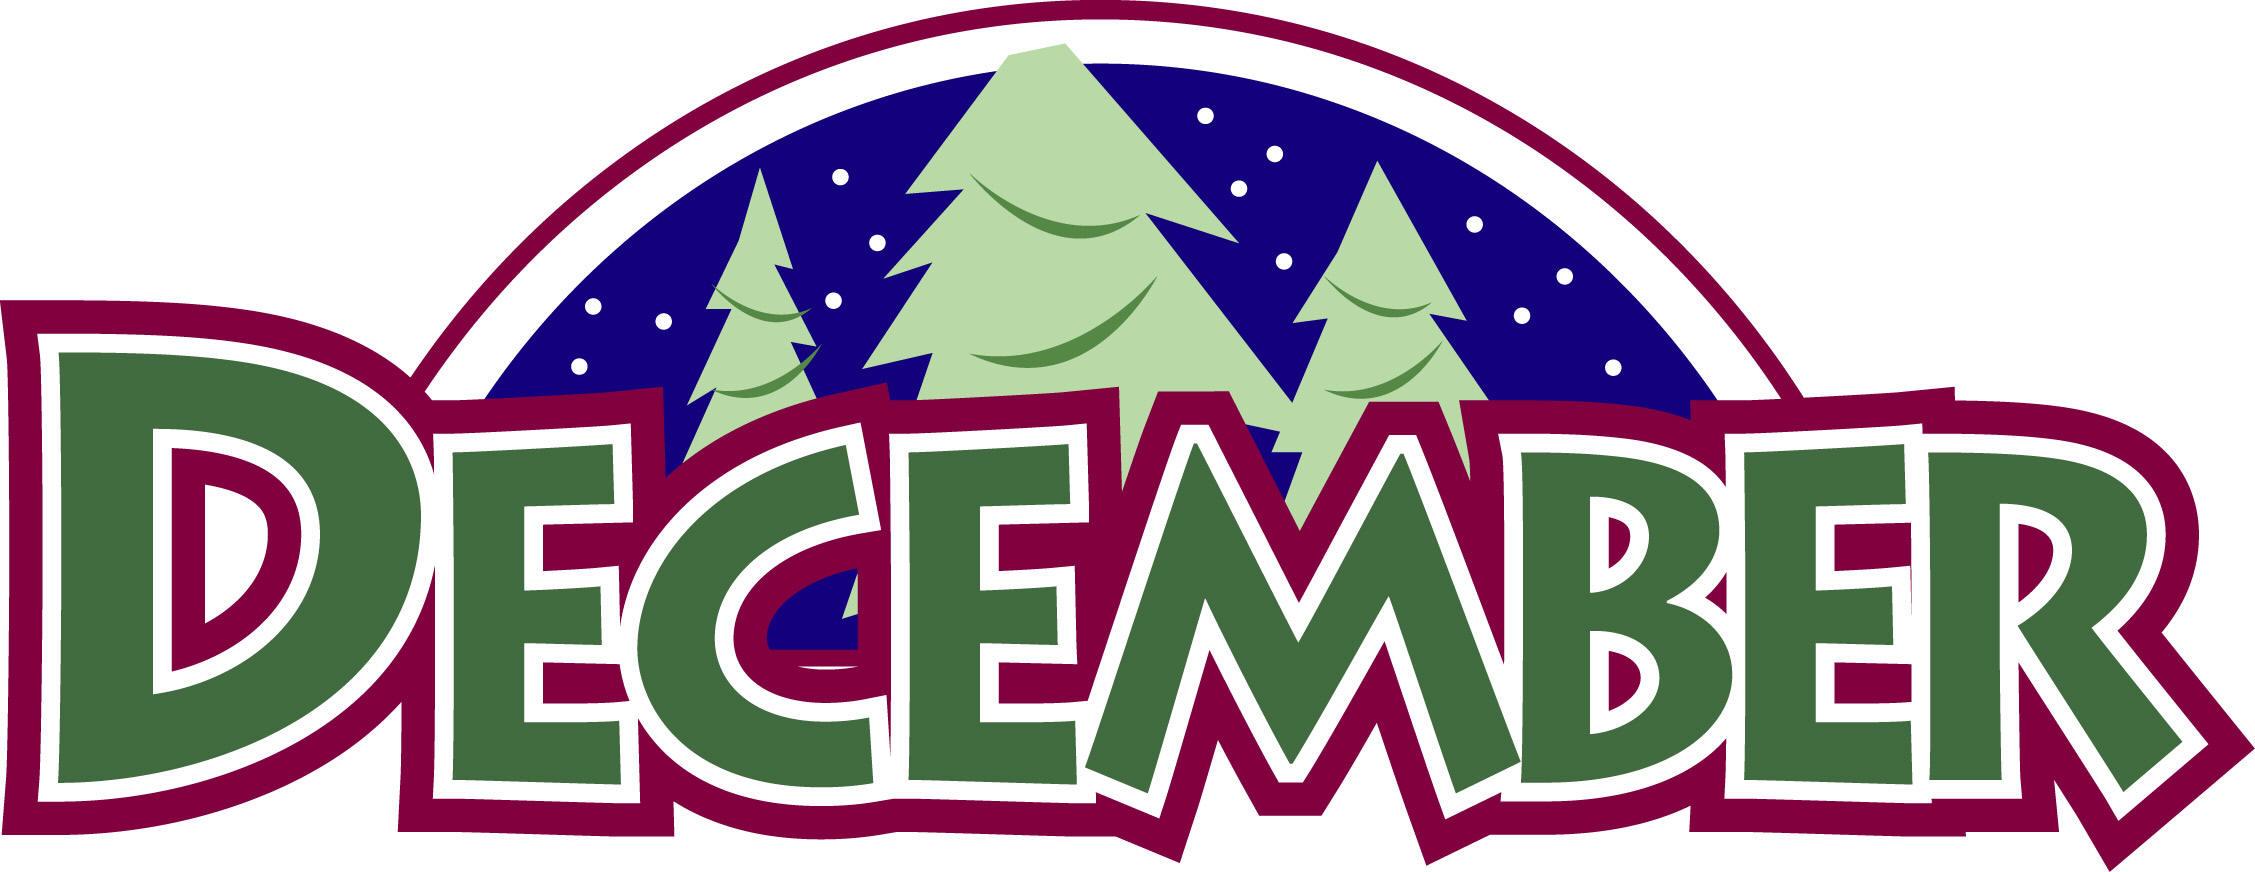 free cliparting com. December clipart december 2016